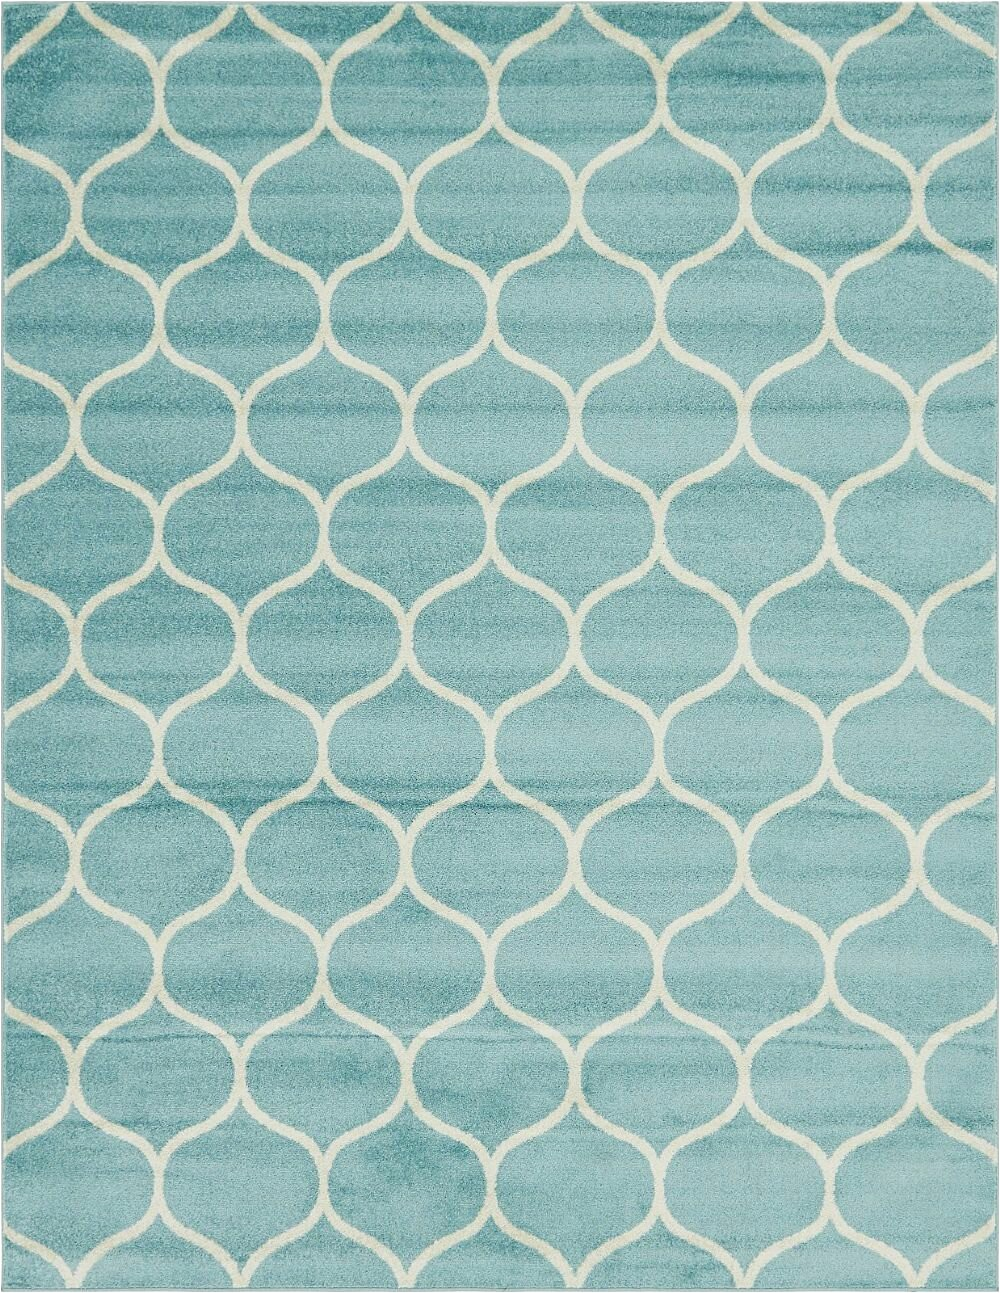 tellaro geometric tealivory area rug